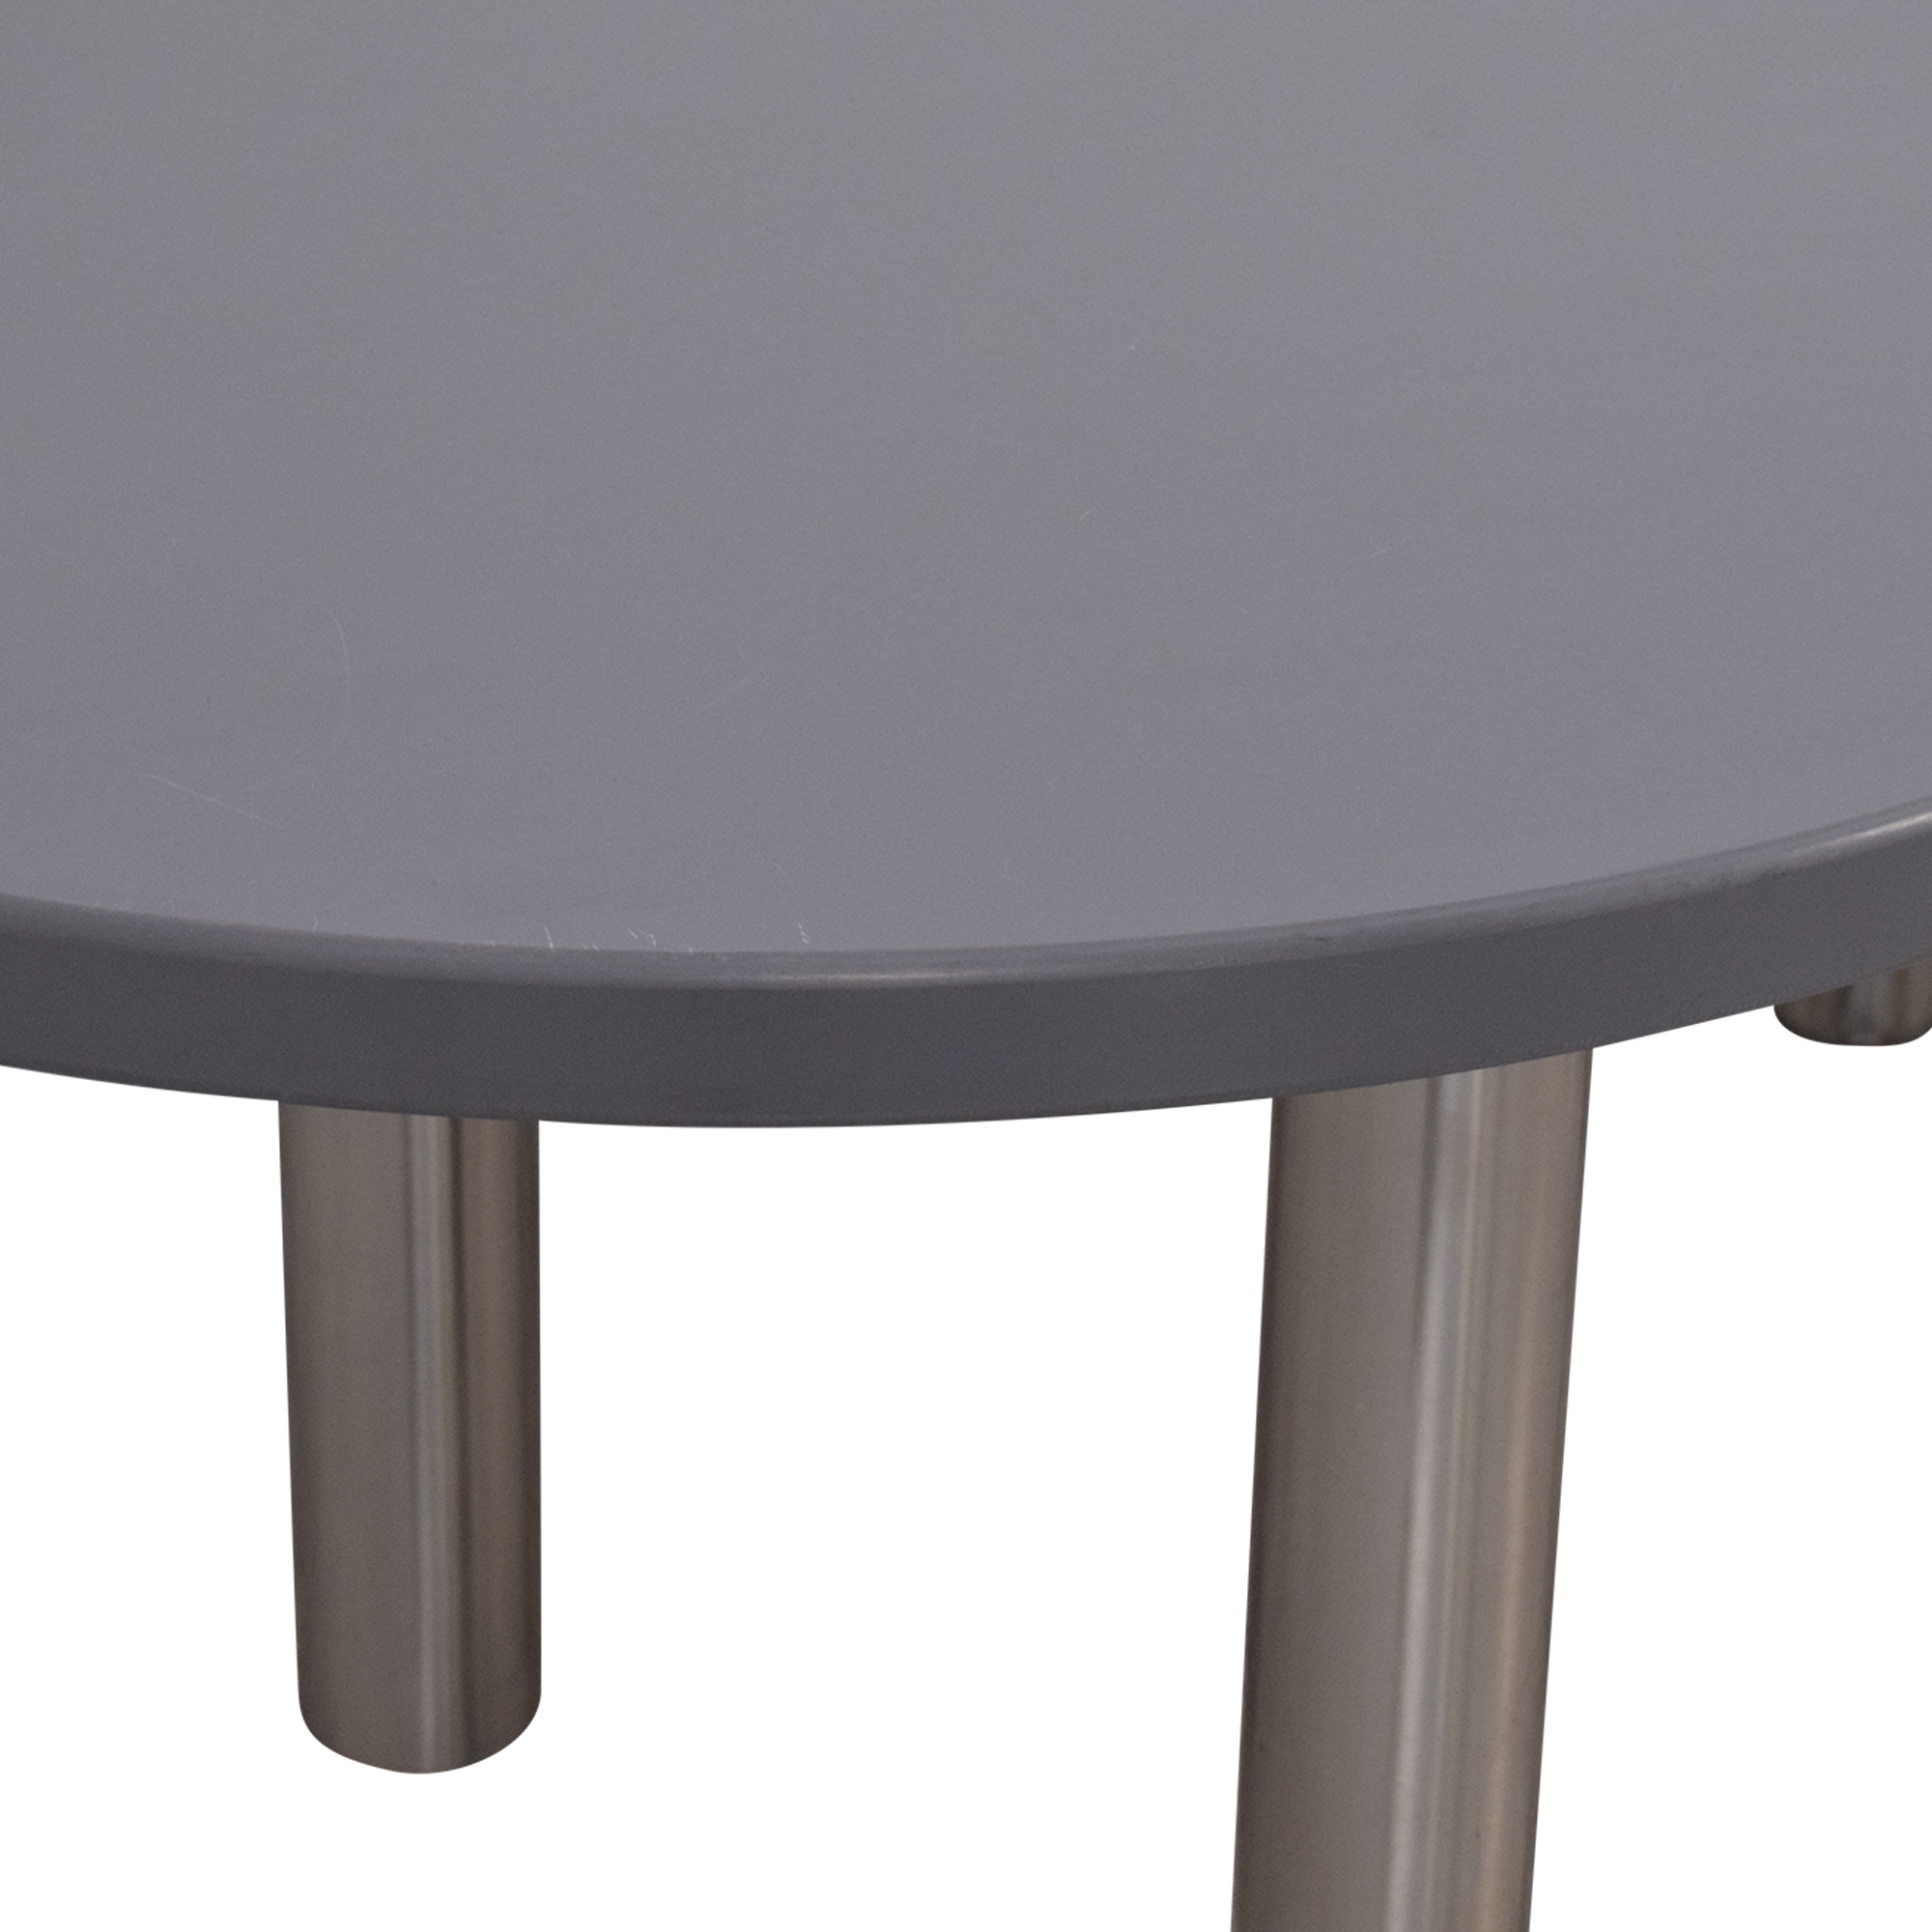 Knoll Knoll Reff Profile Meeting Table ma